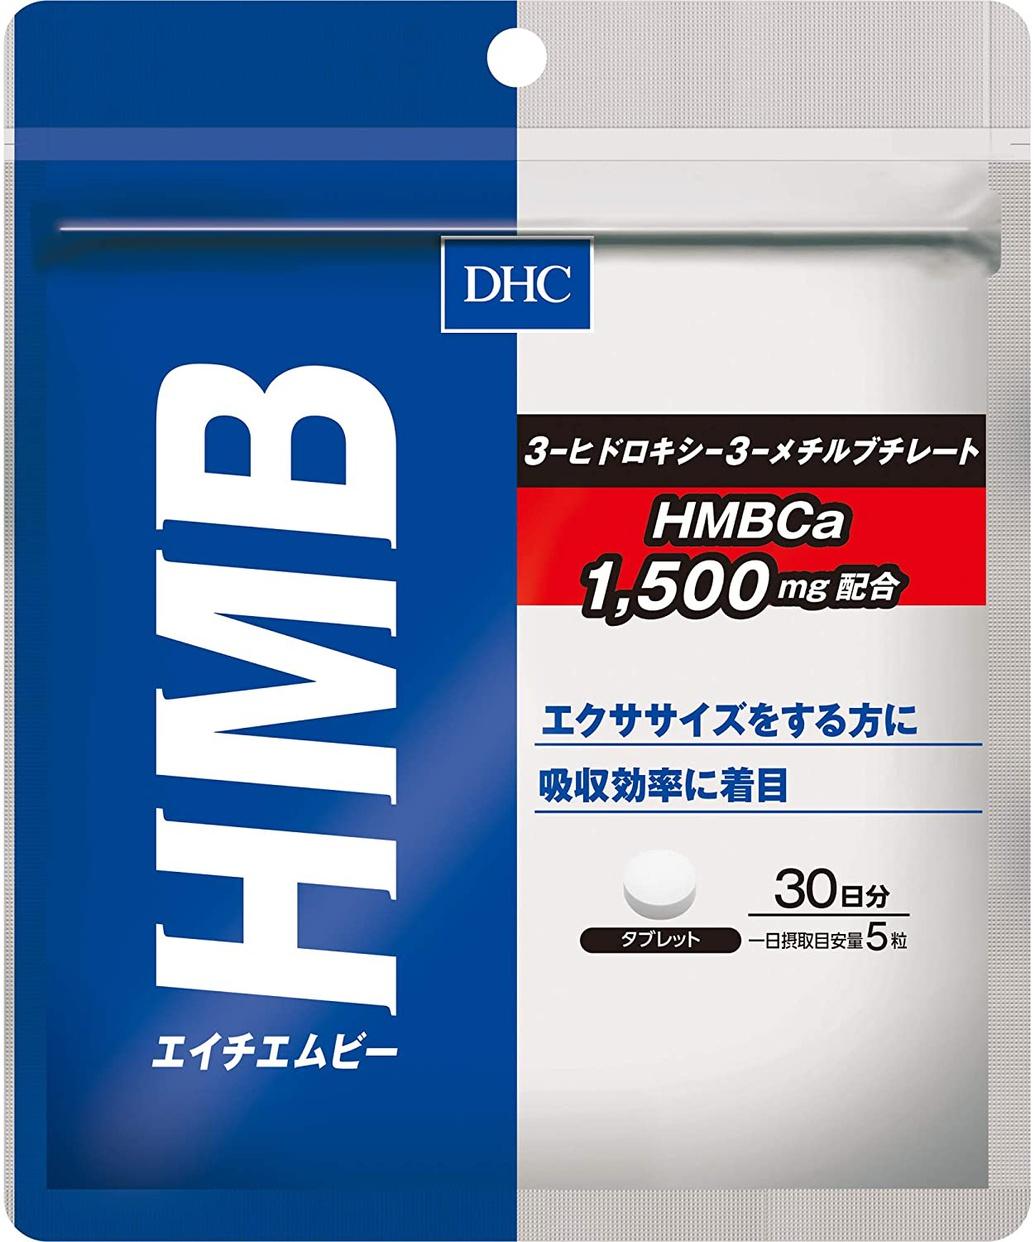 DHC(ディーエイチシー) HMBの商品画像